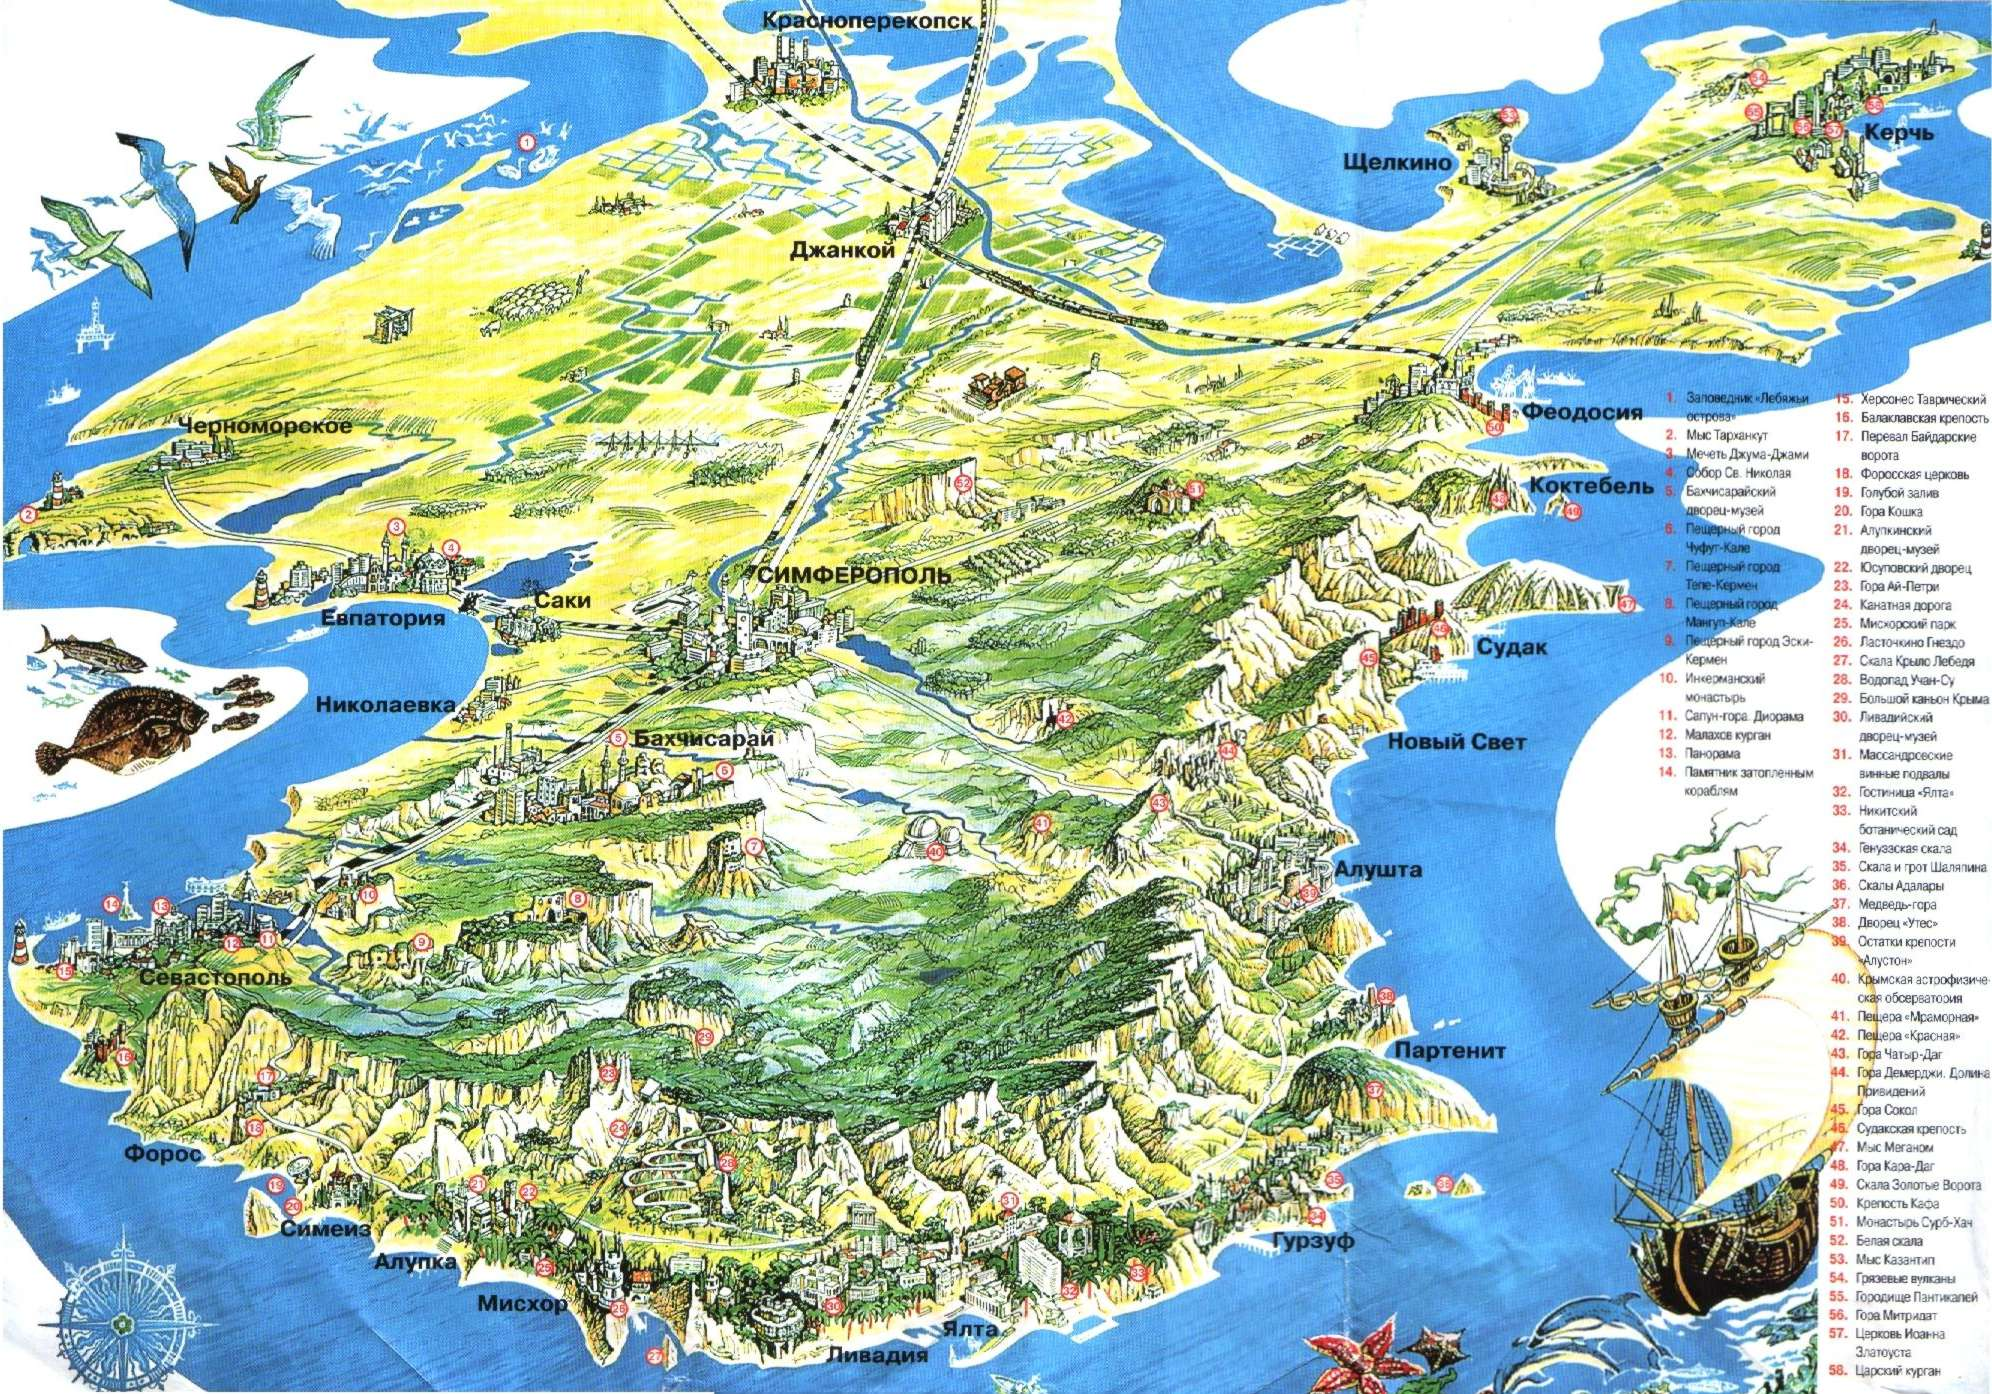 An artist's illustration of Crimea.